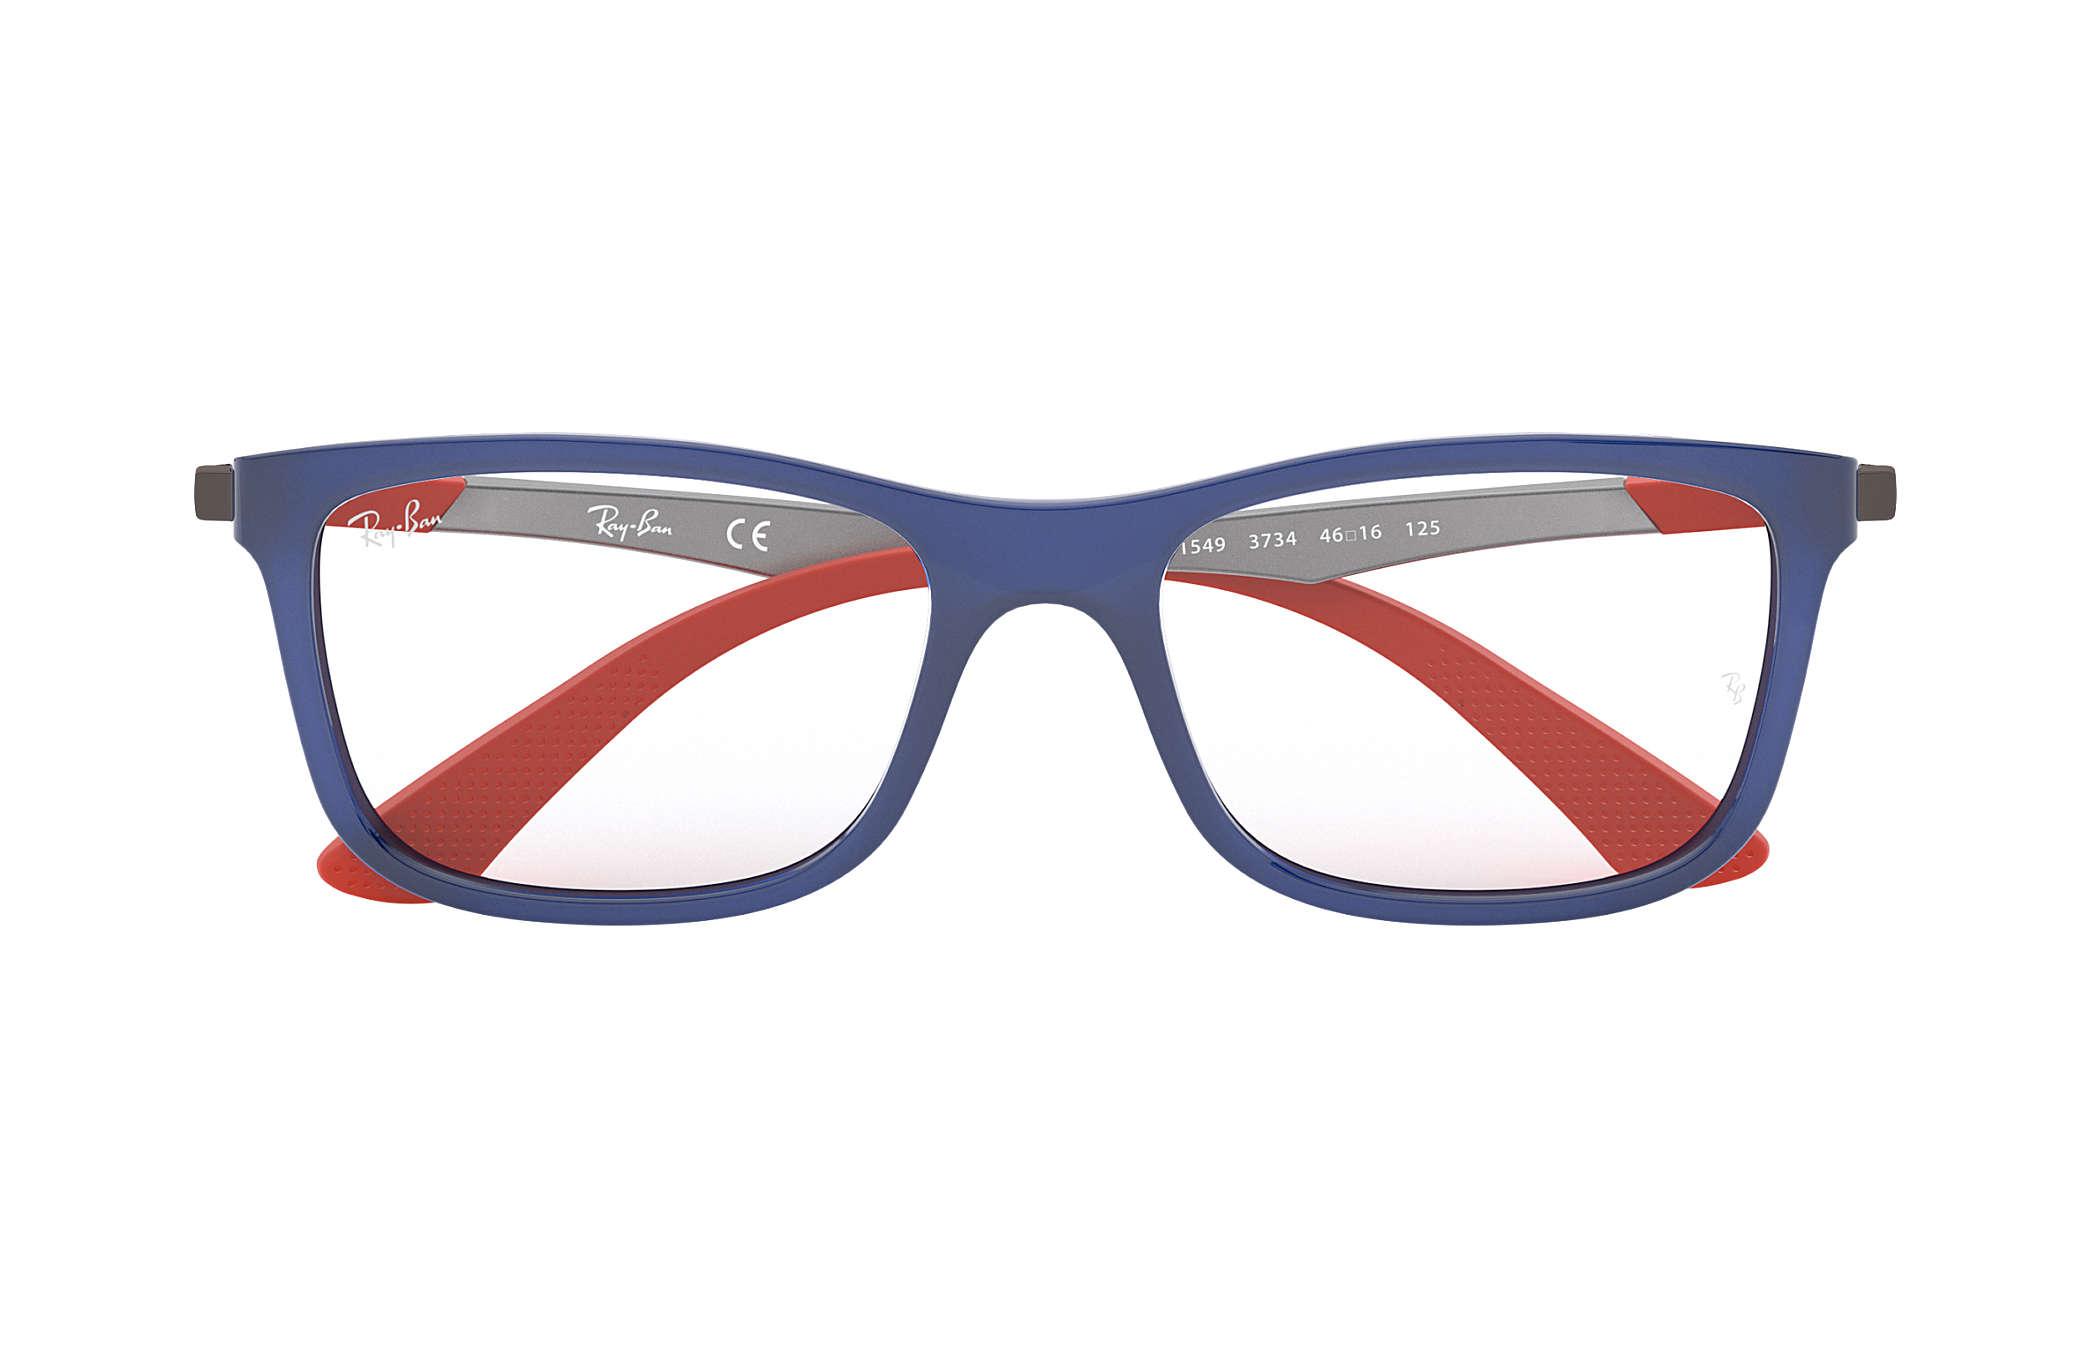 44e94ebb2e Ray-Ban prescription glasses RY1549 Blue - Injected - 0RY1549373446 ...